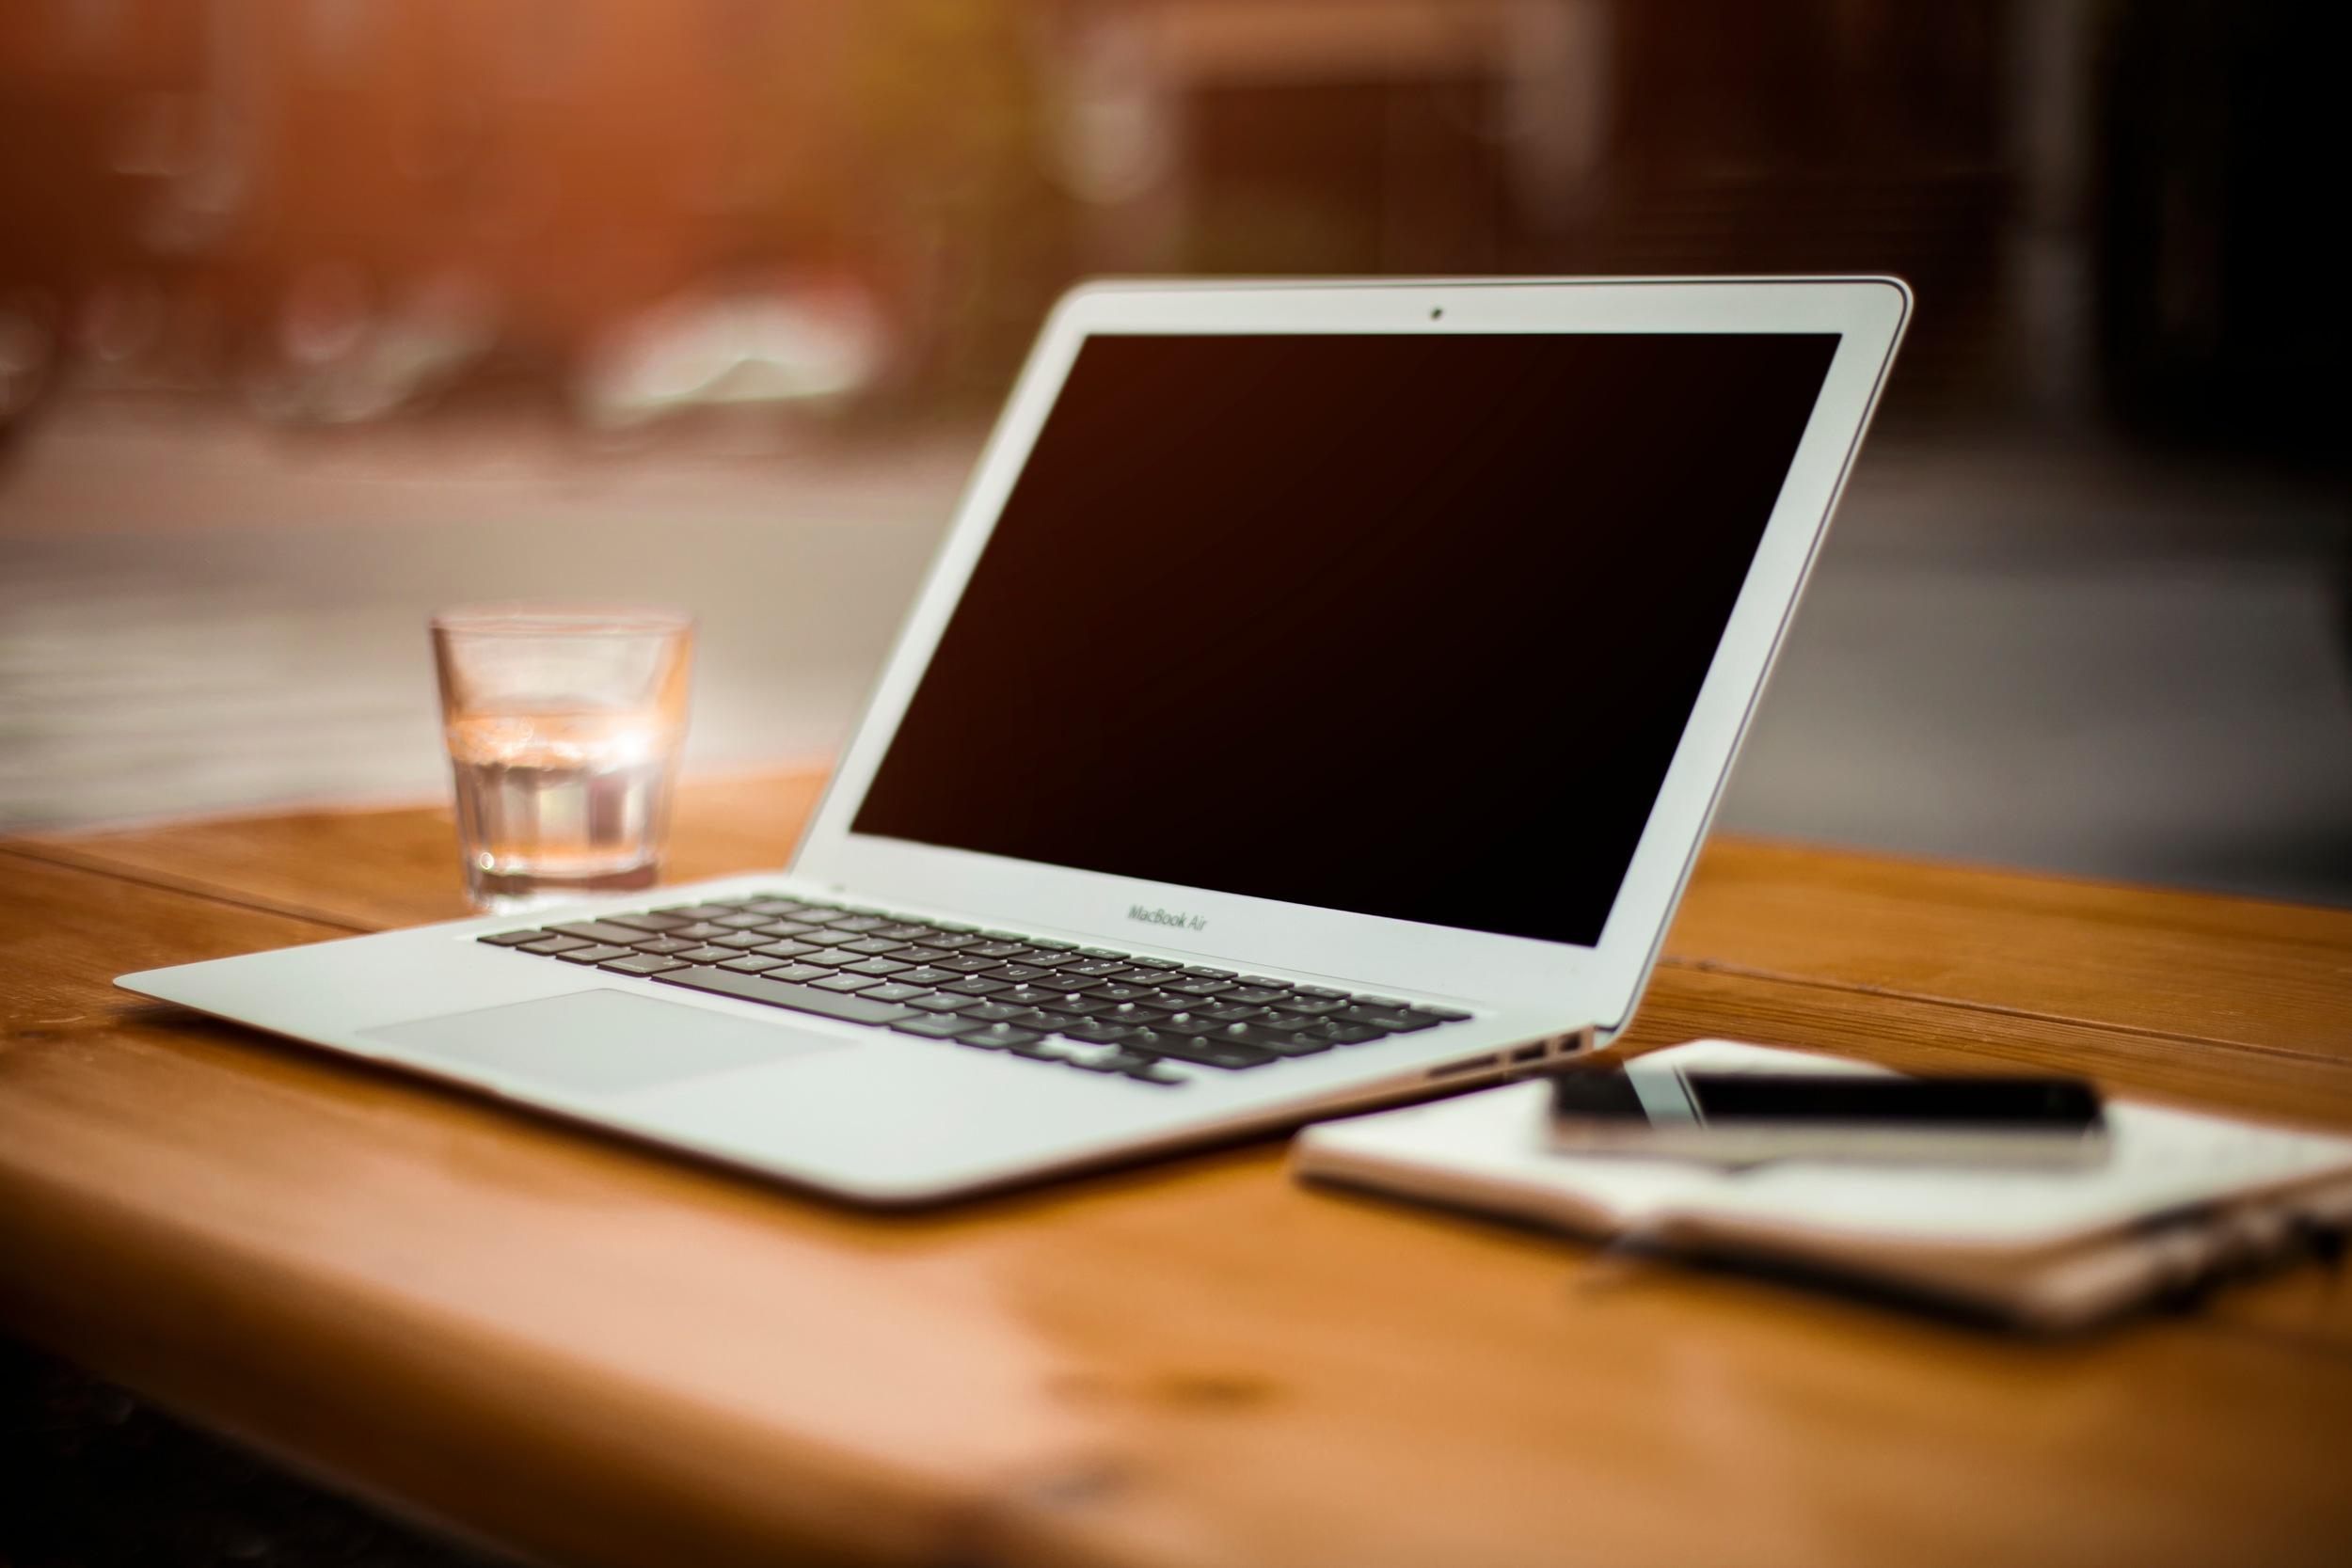 macbook-air-all-faded-and-stuff.jpg